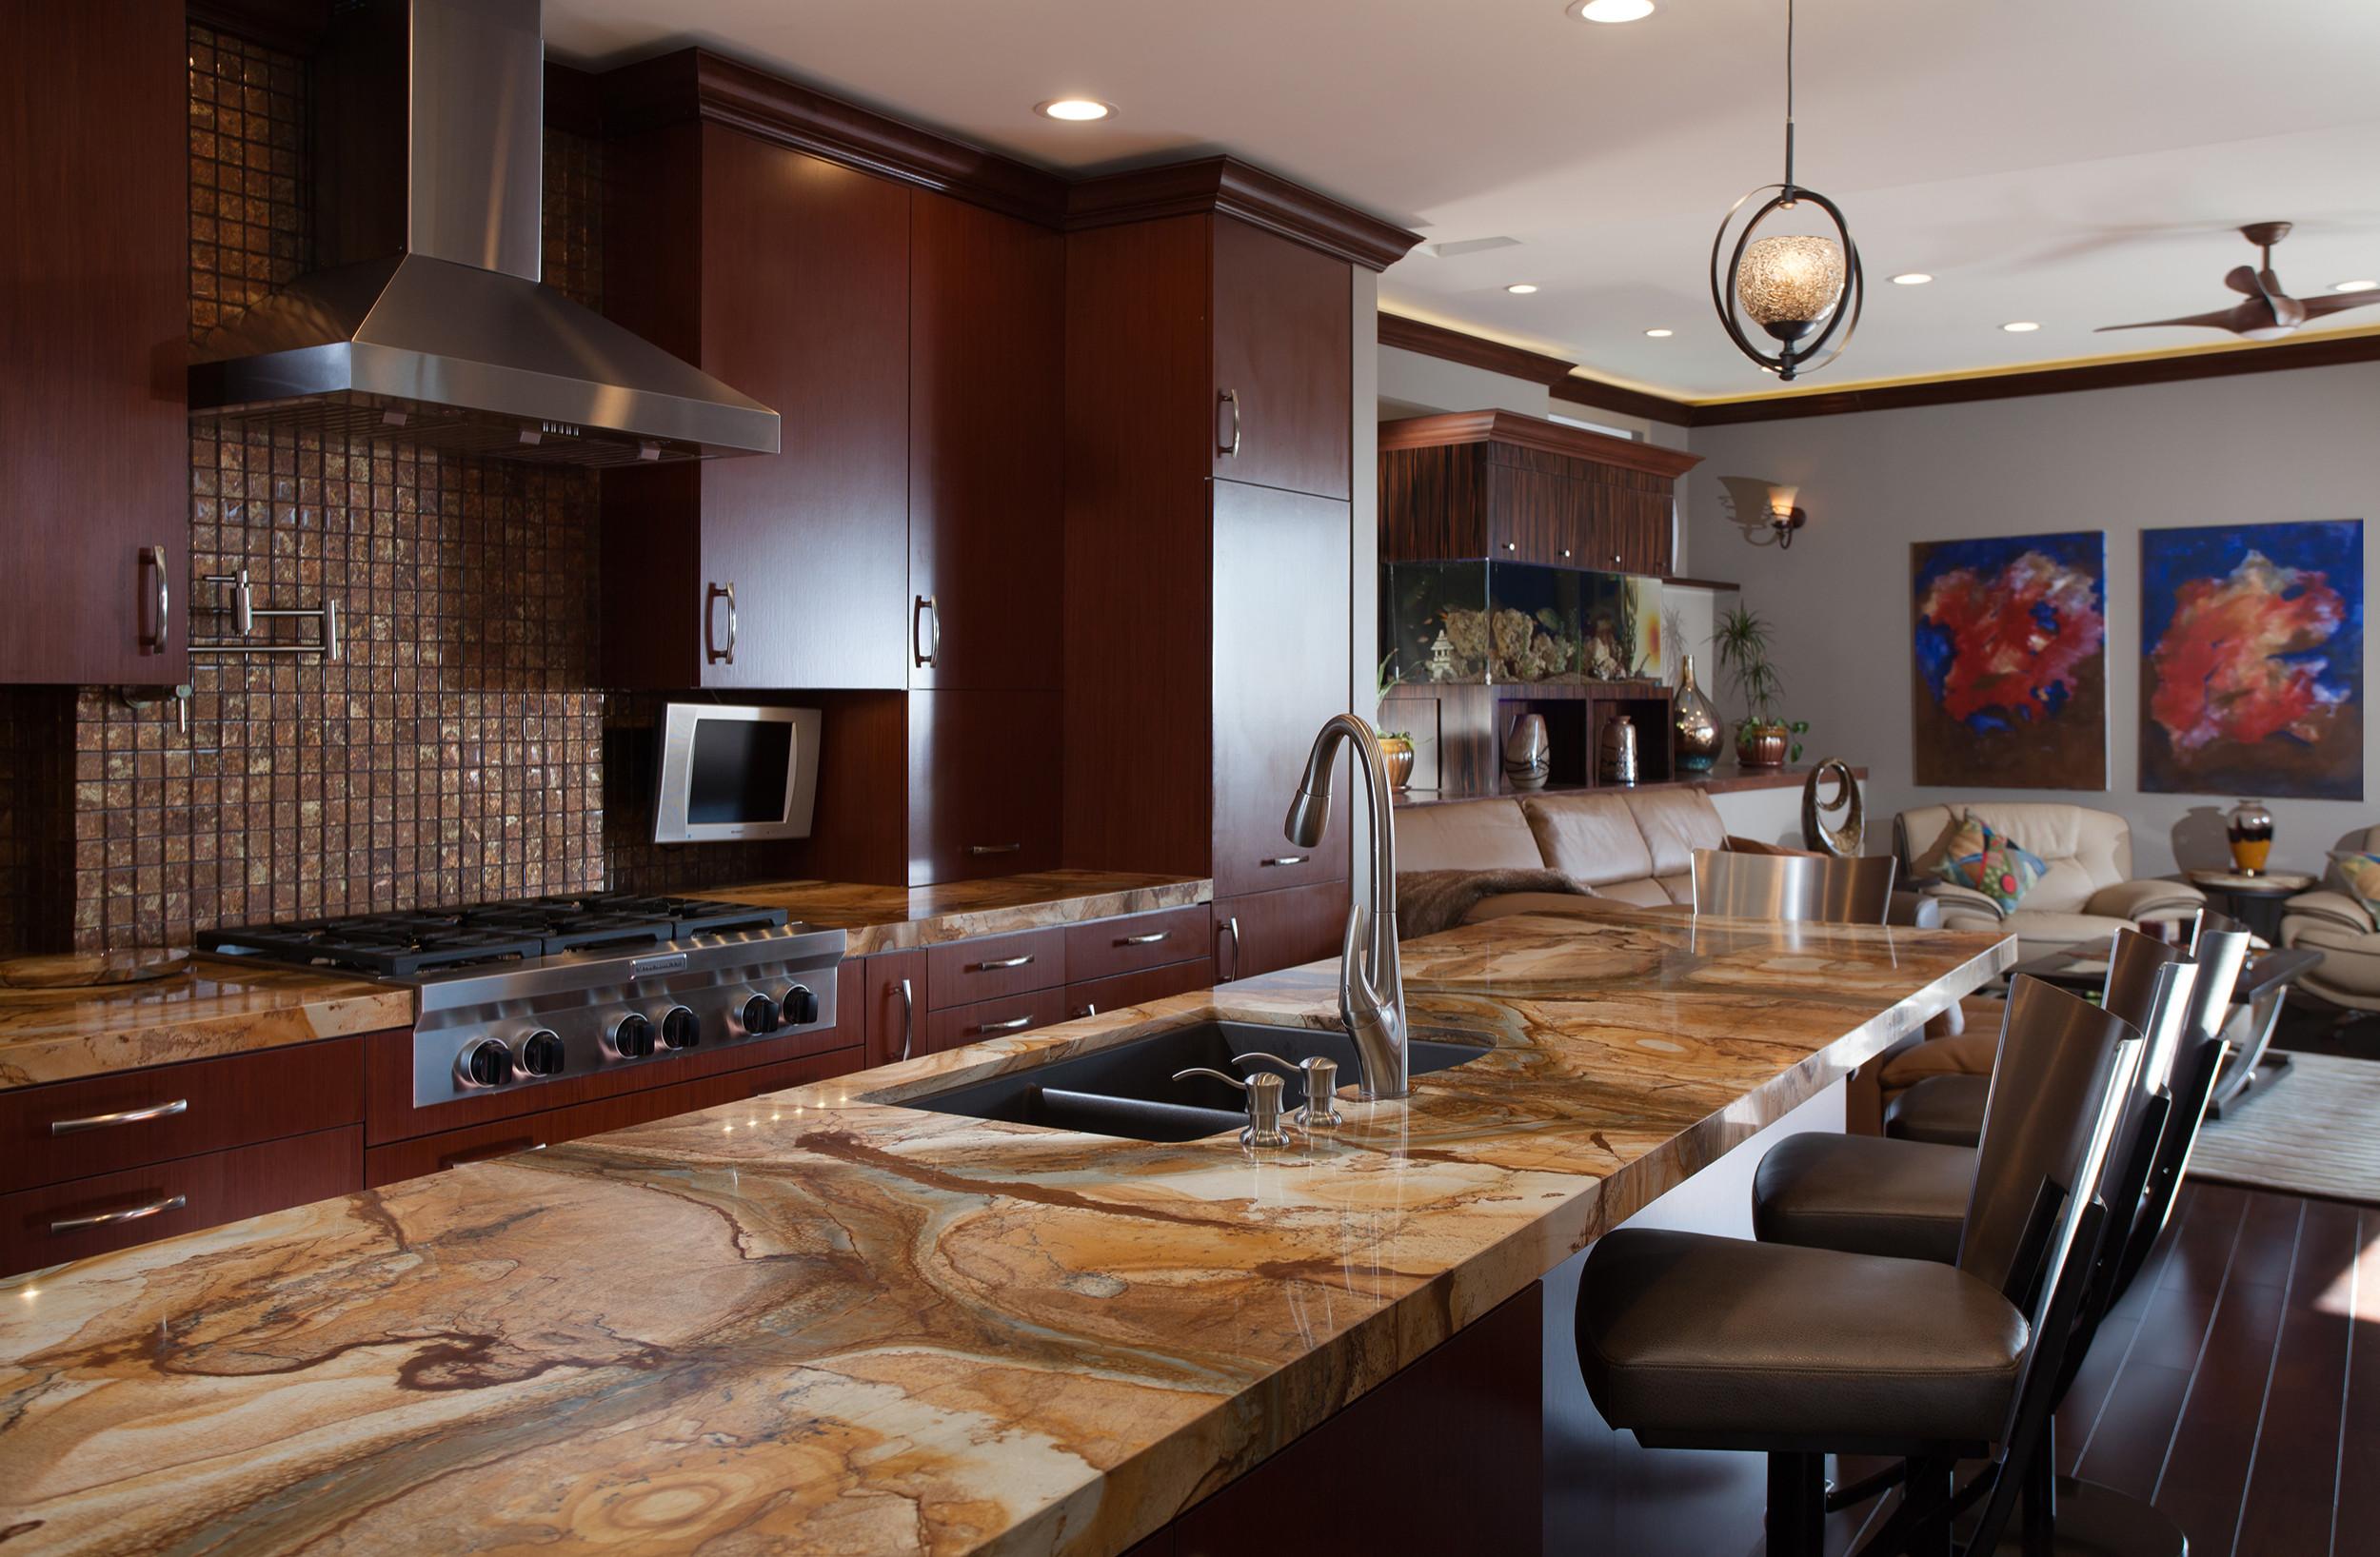 Laguna Beach Kitchen remodel and room addition